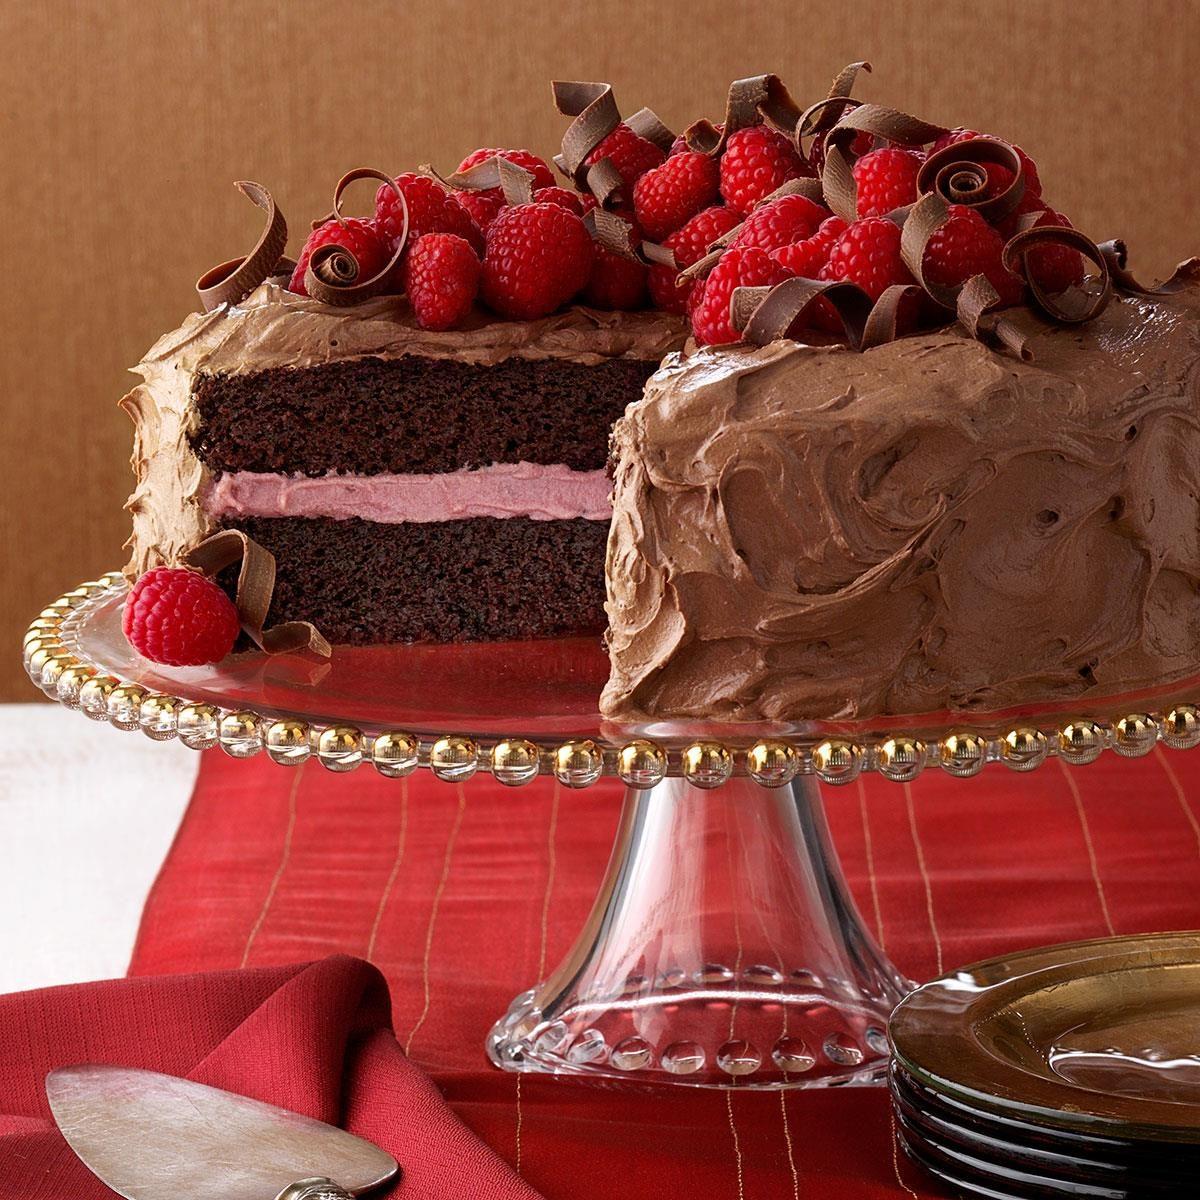 Chocolate Raspberry Cake Recipe | Taste of Home